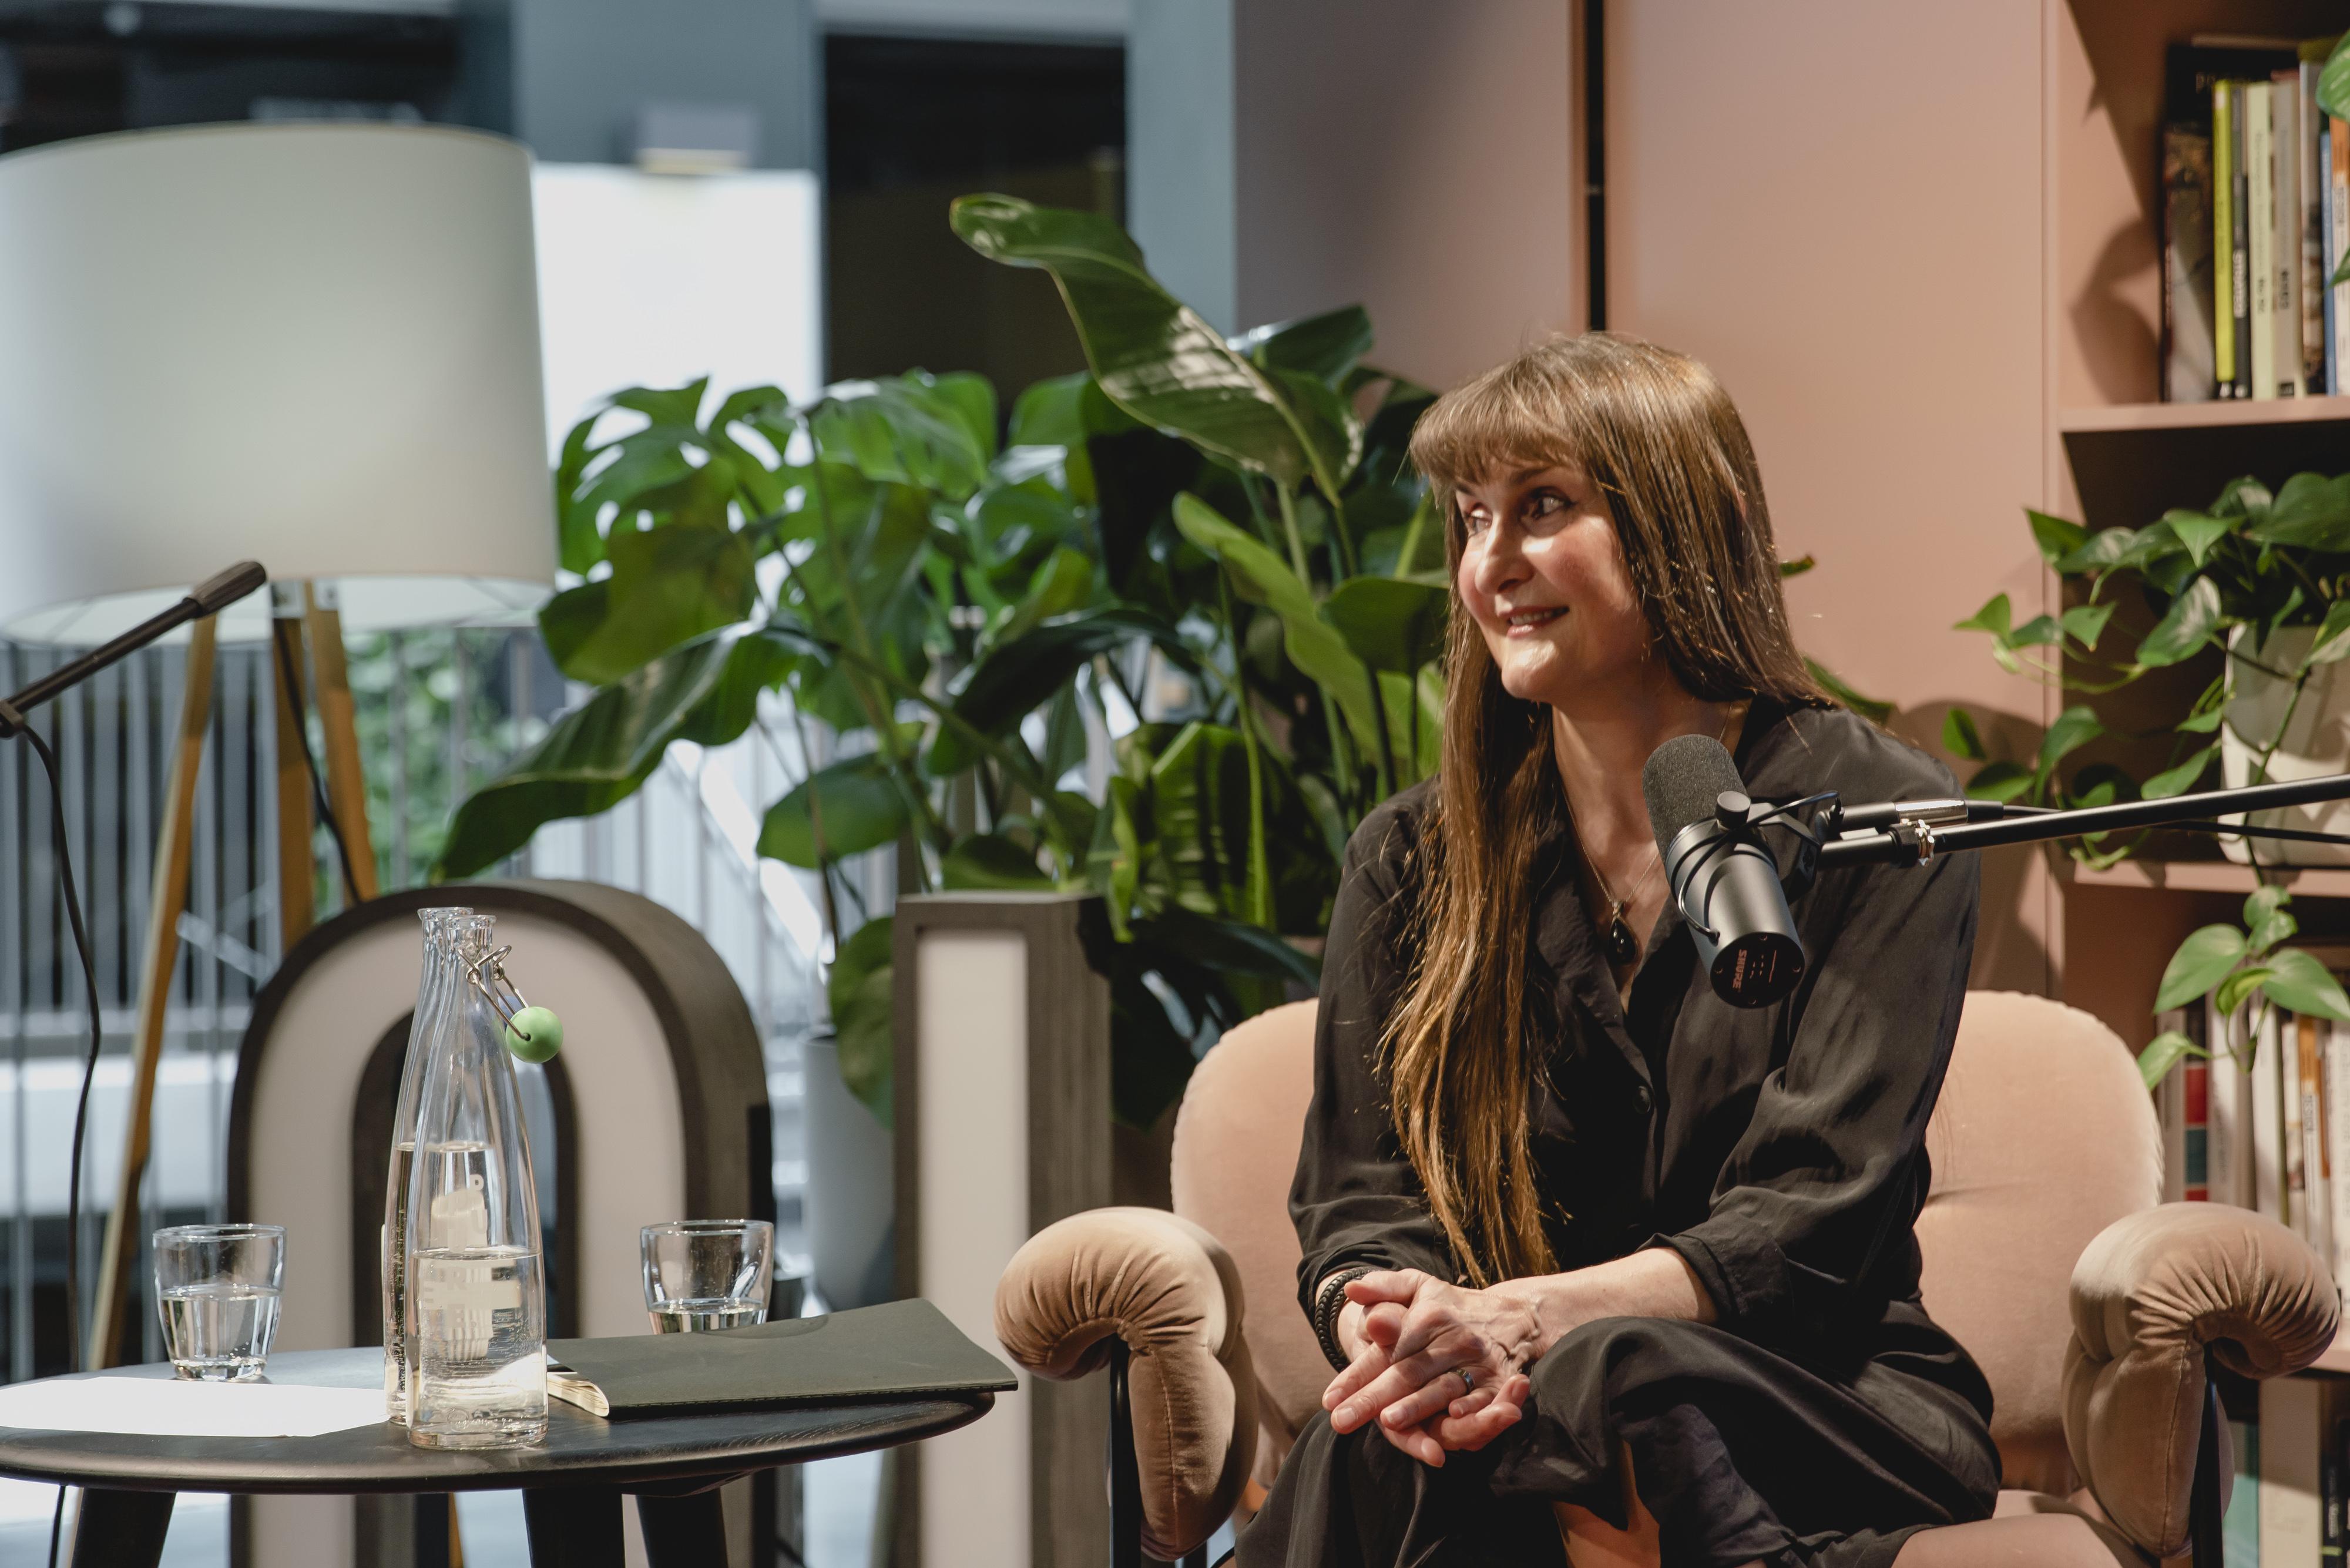 Wanda Grimsgaard under fagpraten, som ble sendt live direkte fra Netlifes lokaler i Oslo.